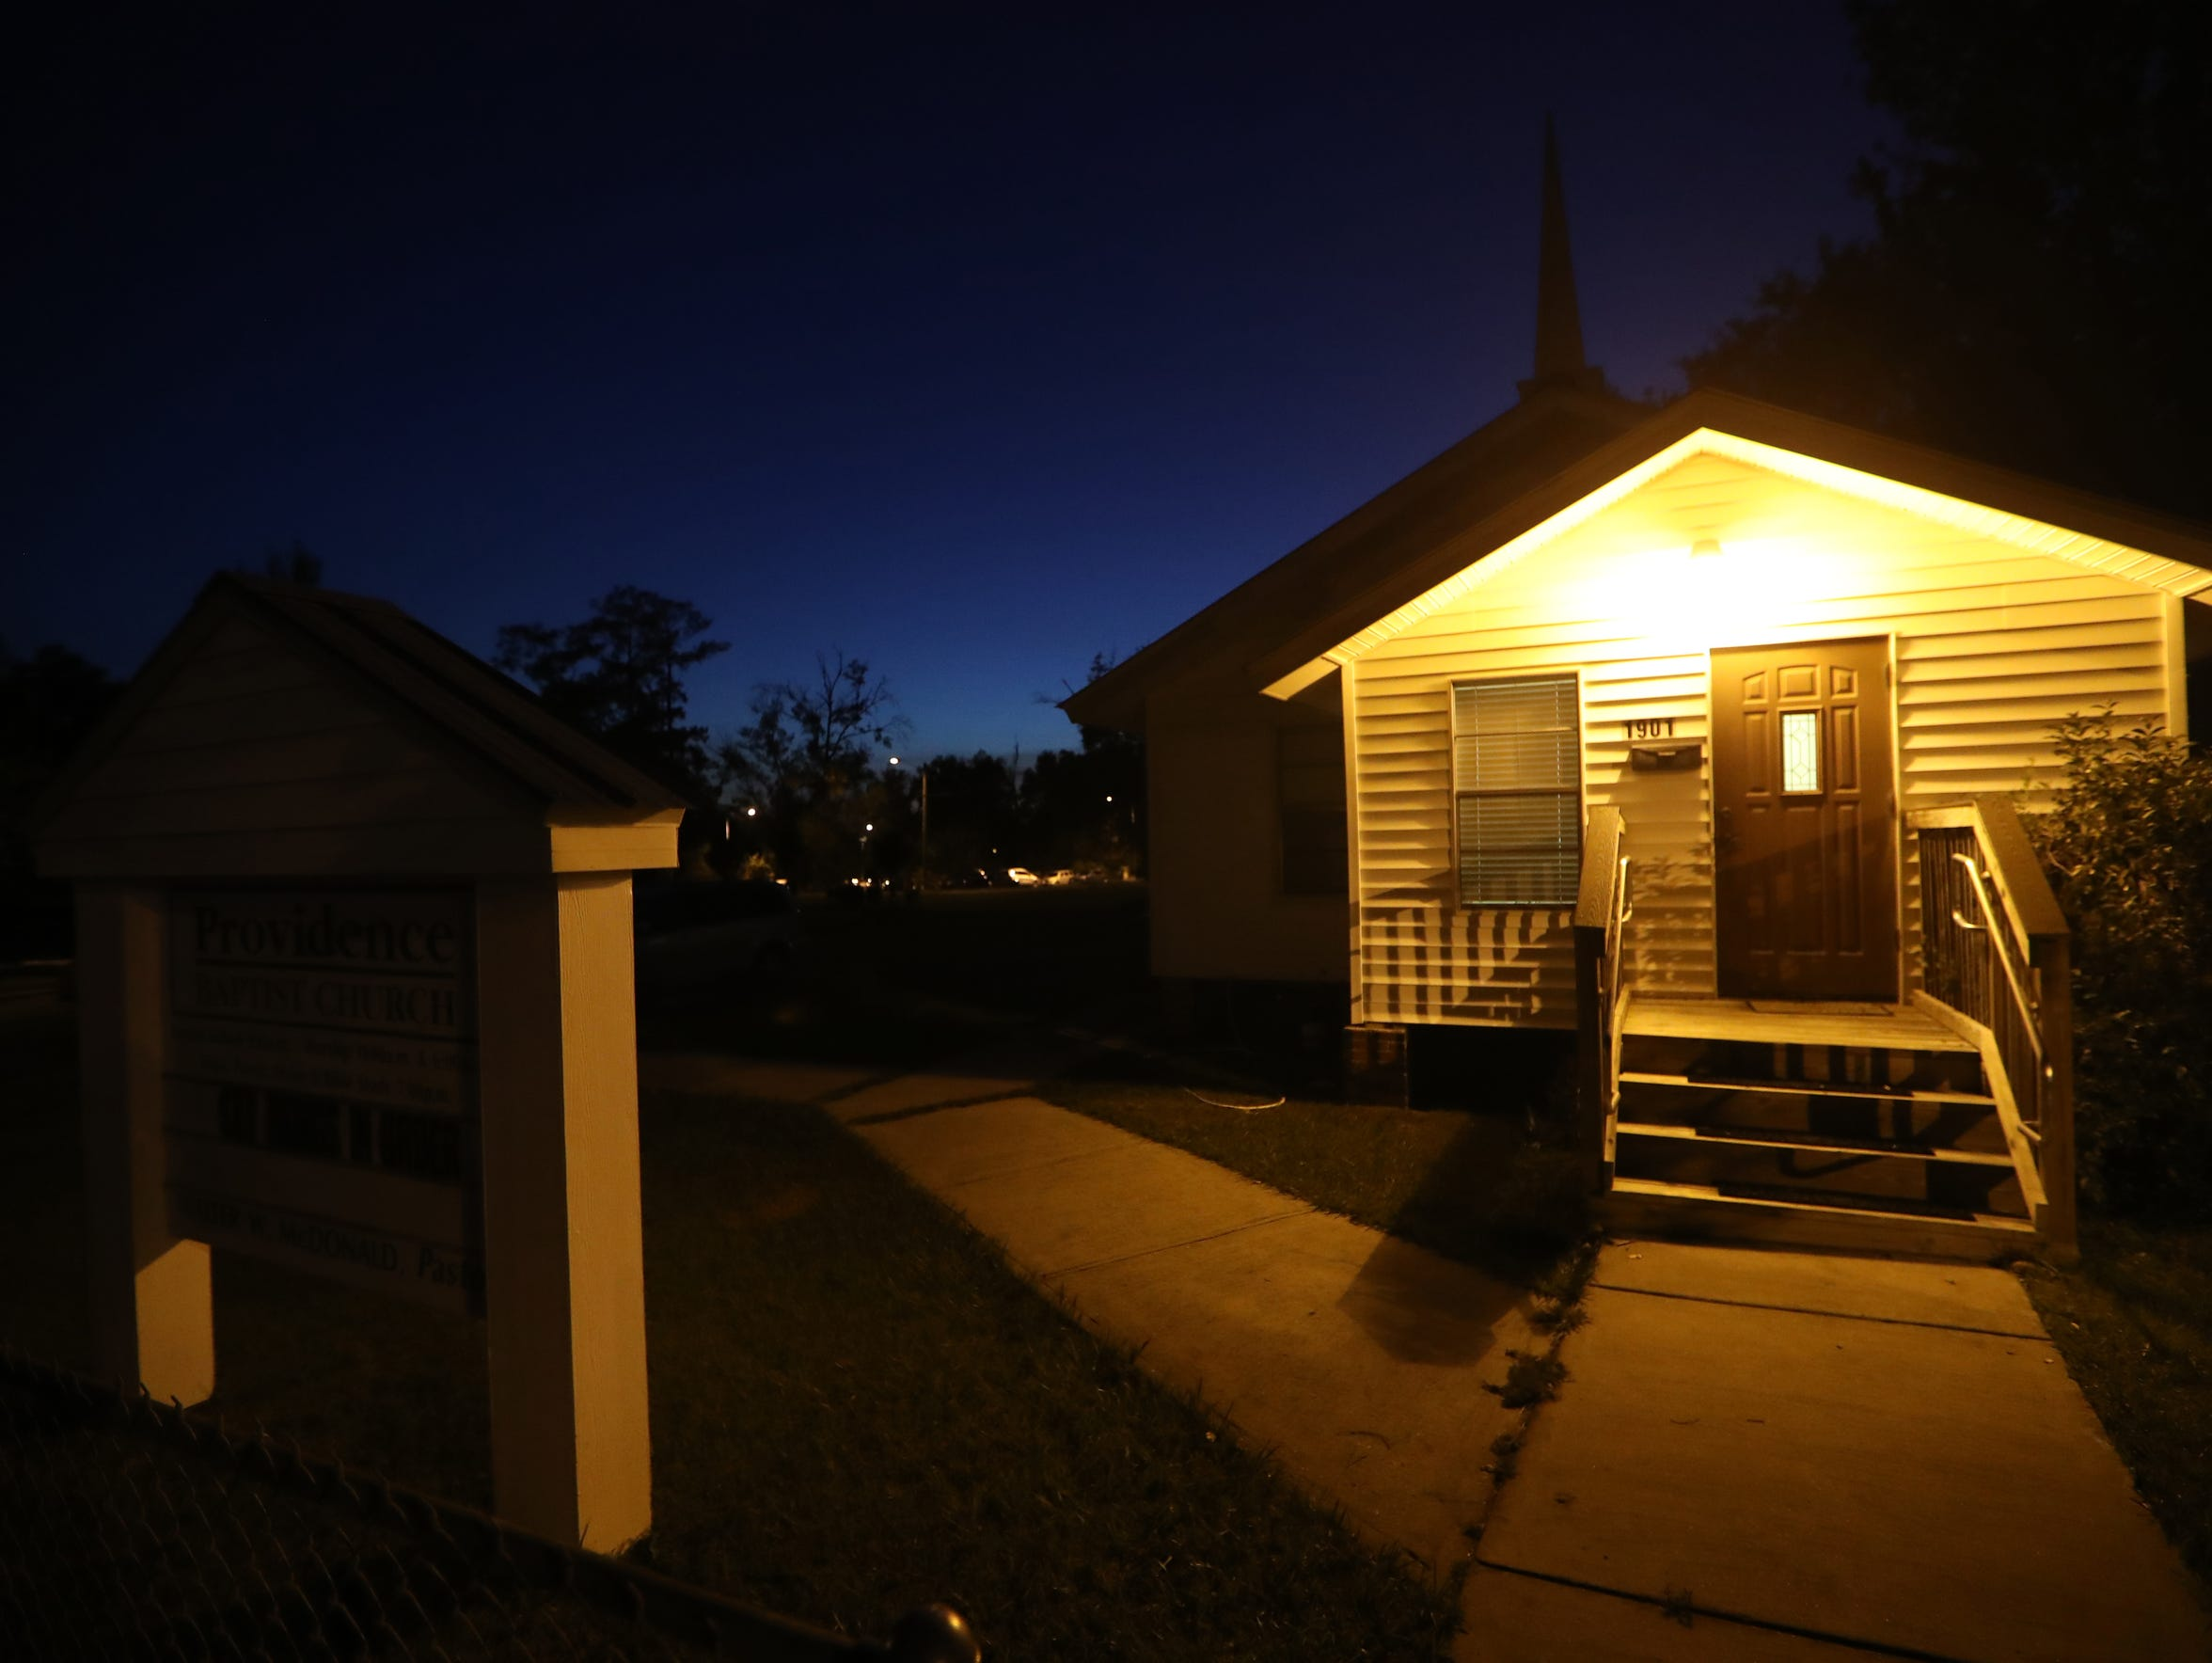 Providence Baptist Church in the Southside neighborhood